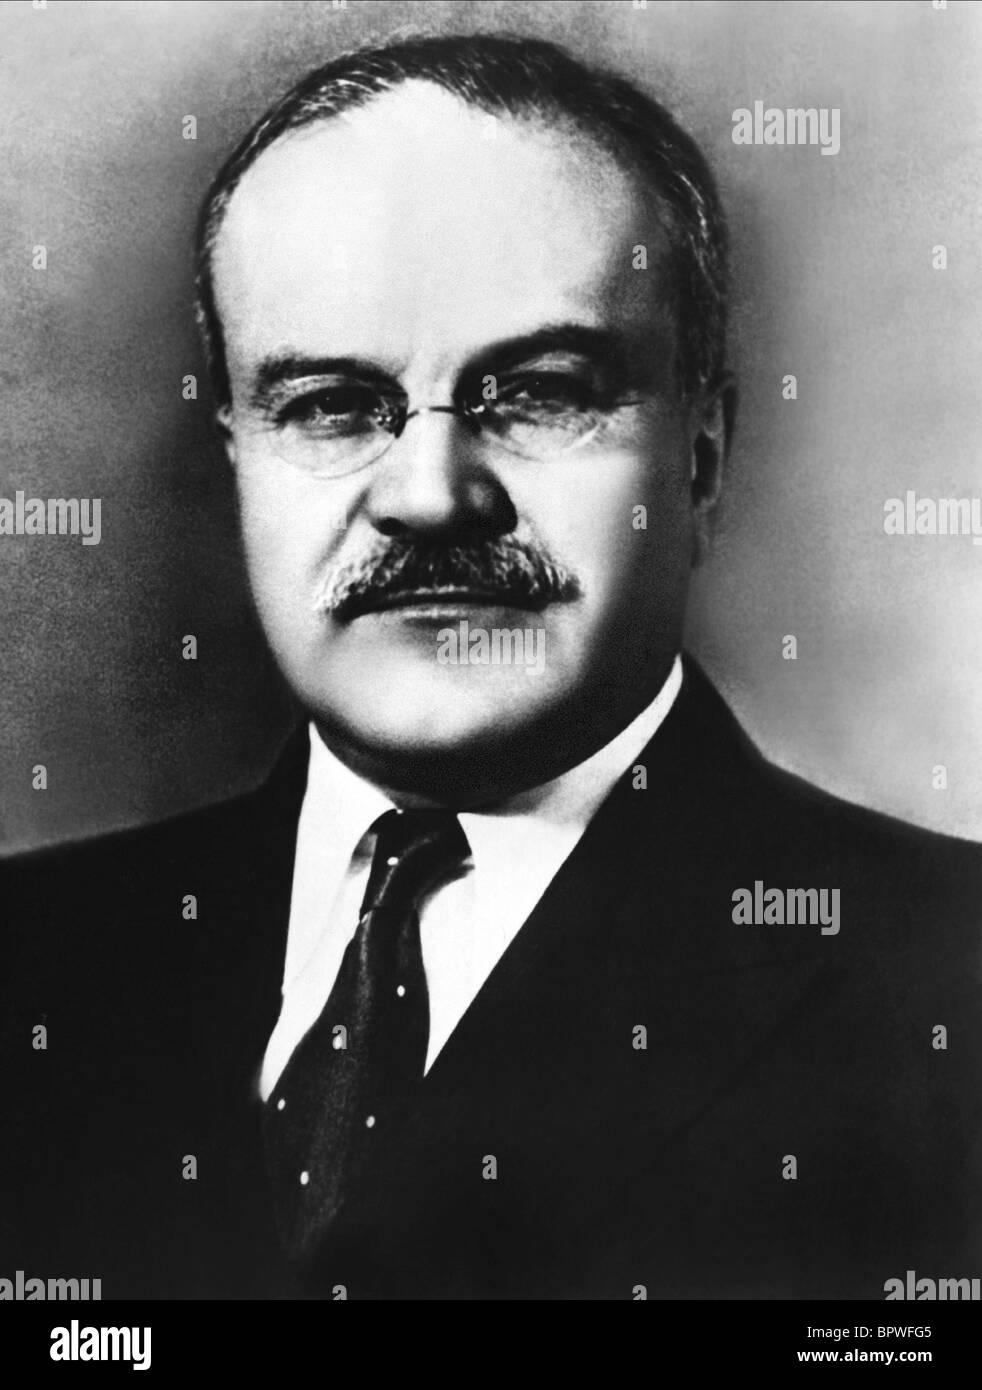 VYACHESLAV MOLOTOV SOVIET DIPLOMAT 01 June 1959 - Stock Image